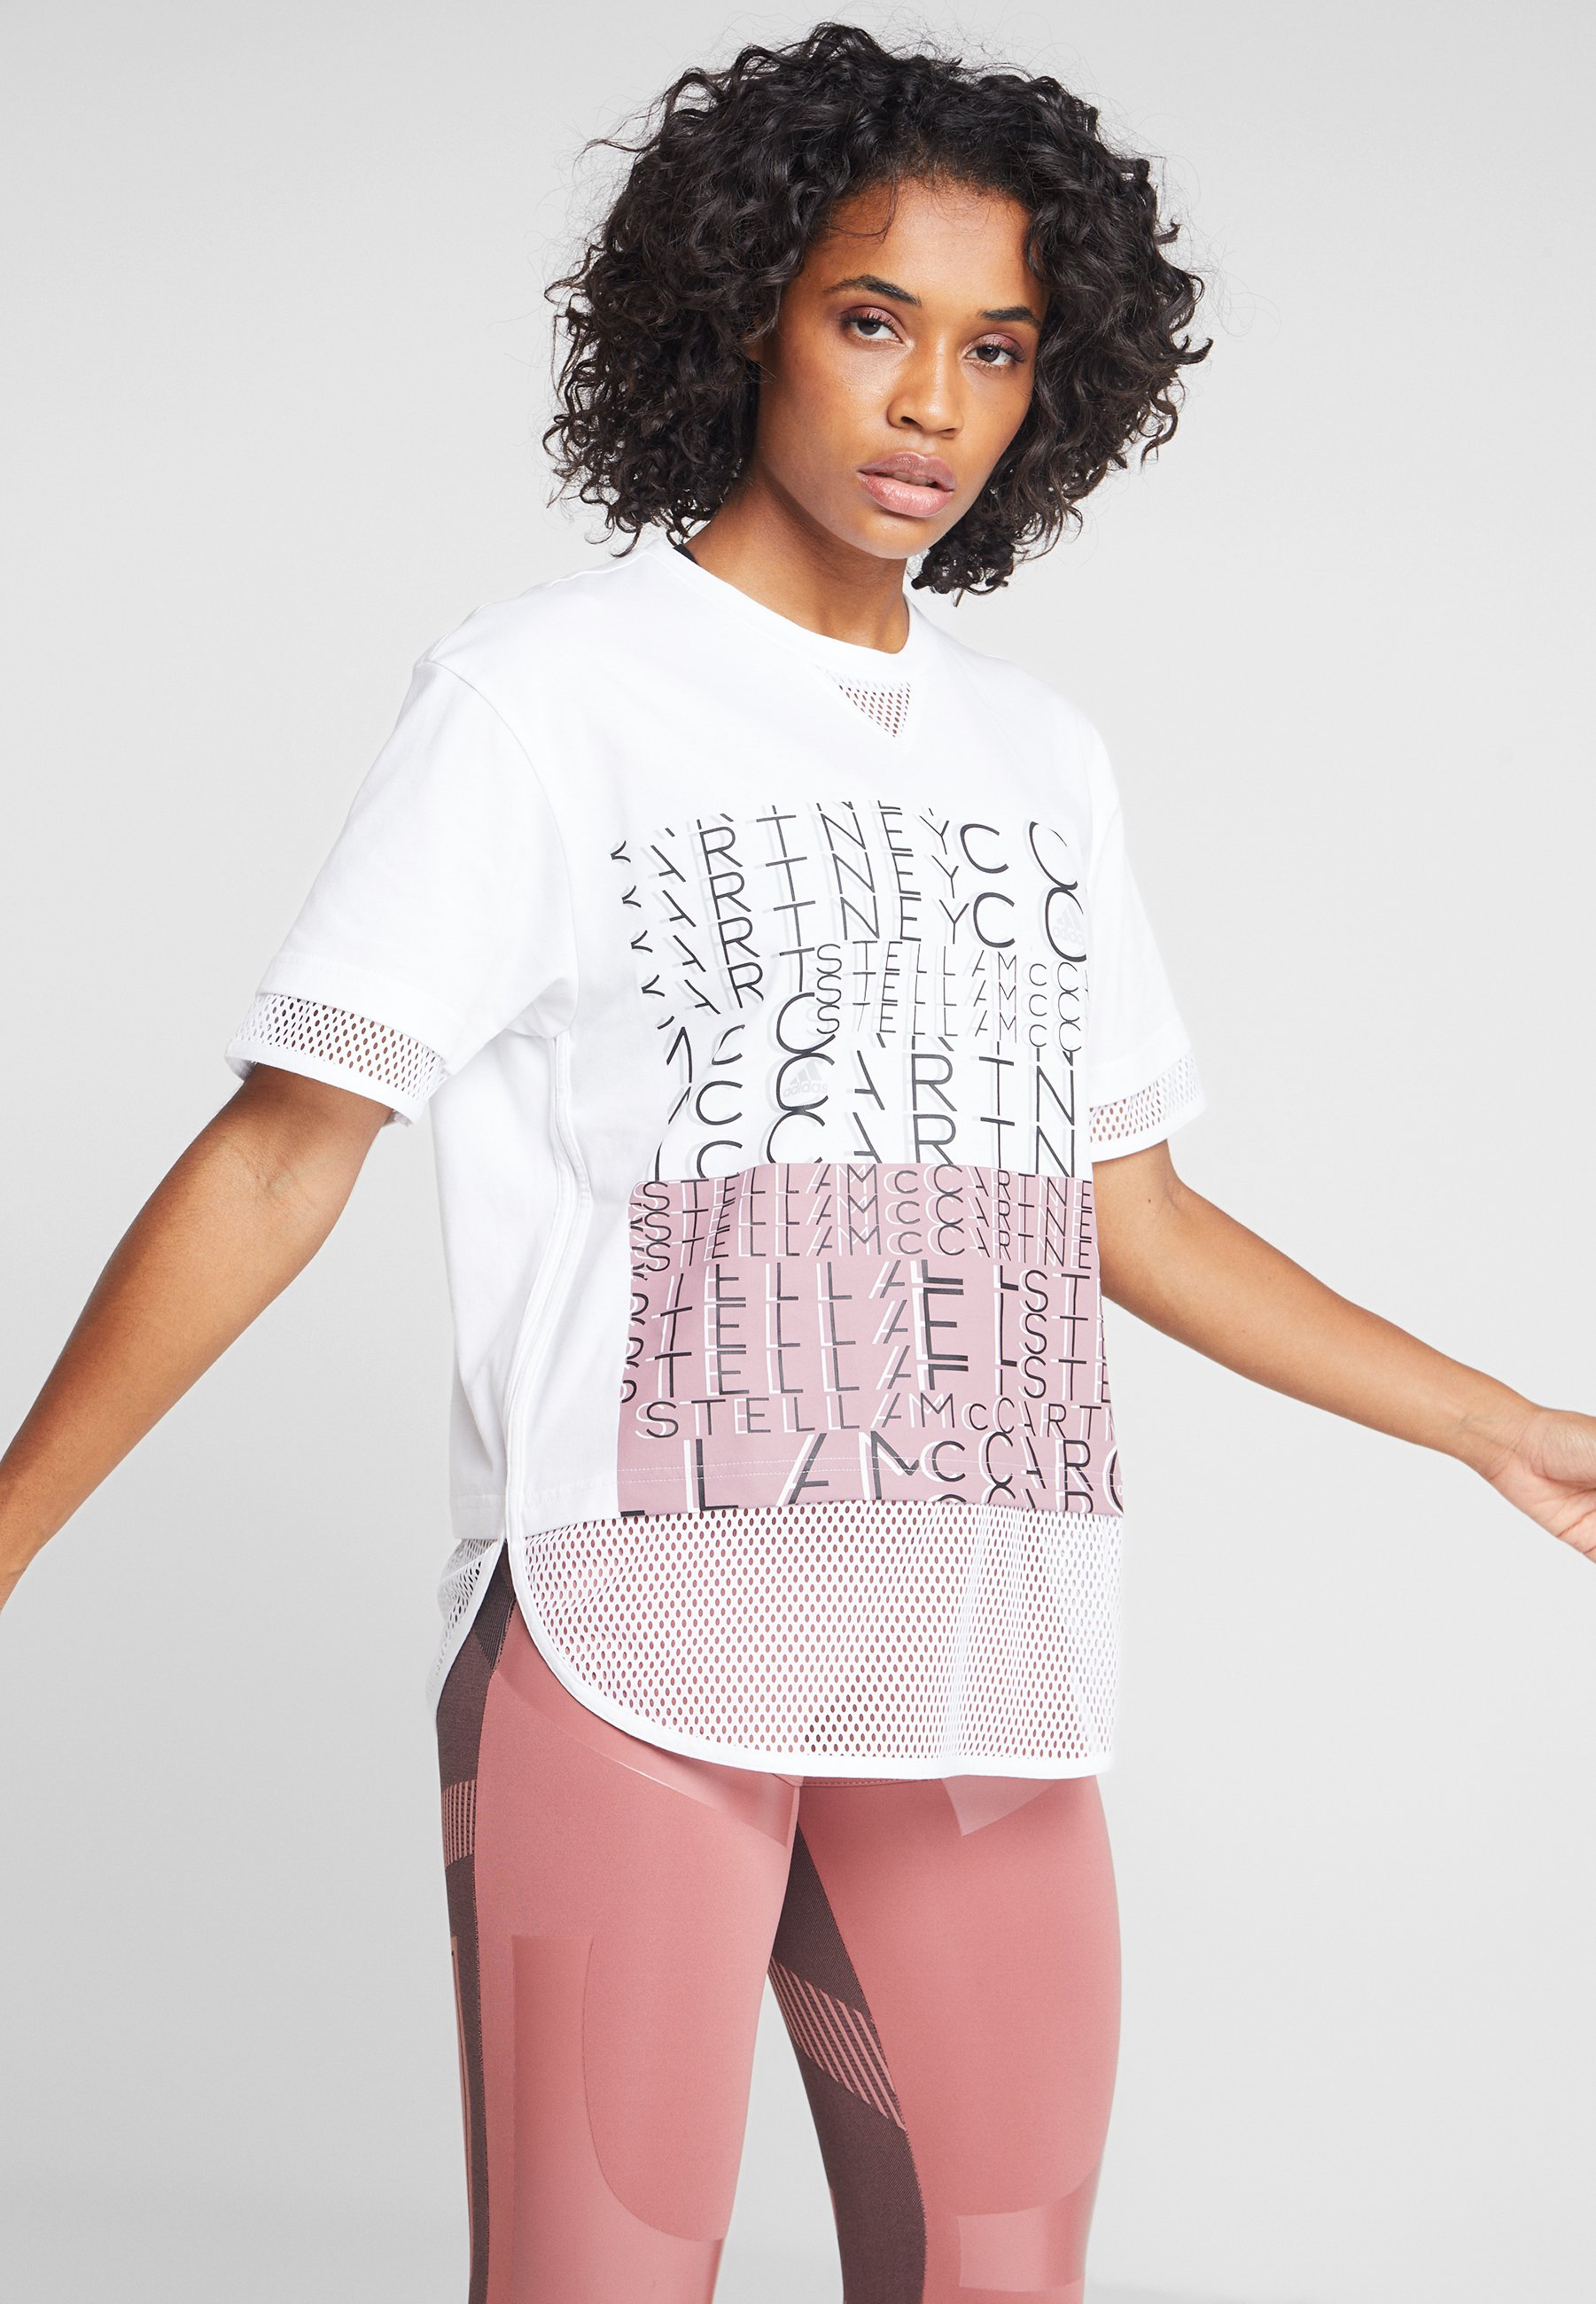 Logo Stella Imprimé shirt Mccartney White Adidas By TeeT BCWEeQdrxo